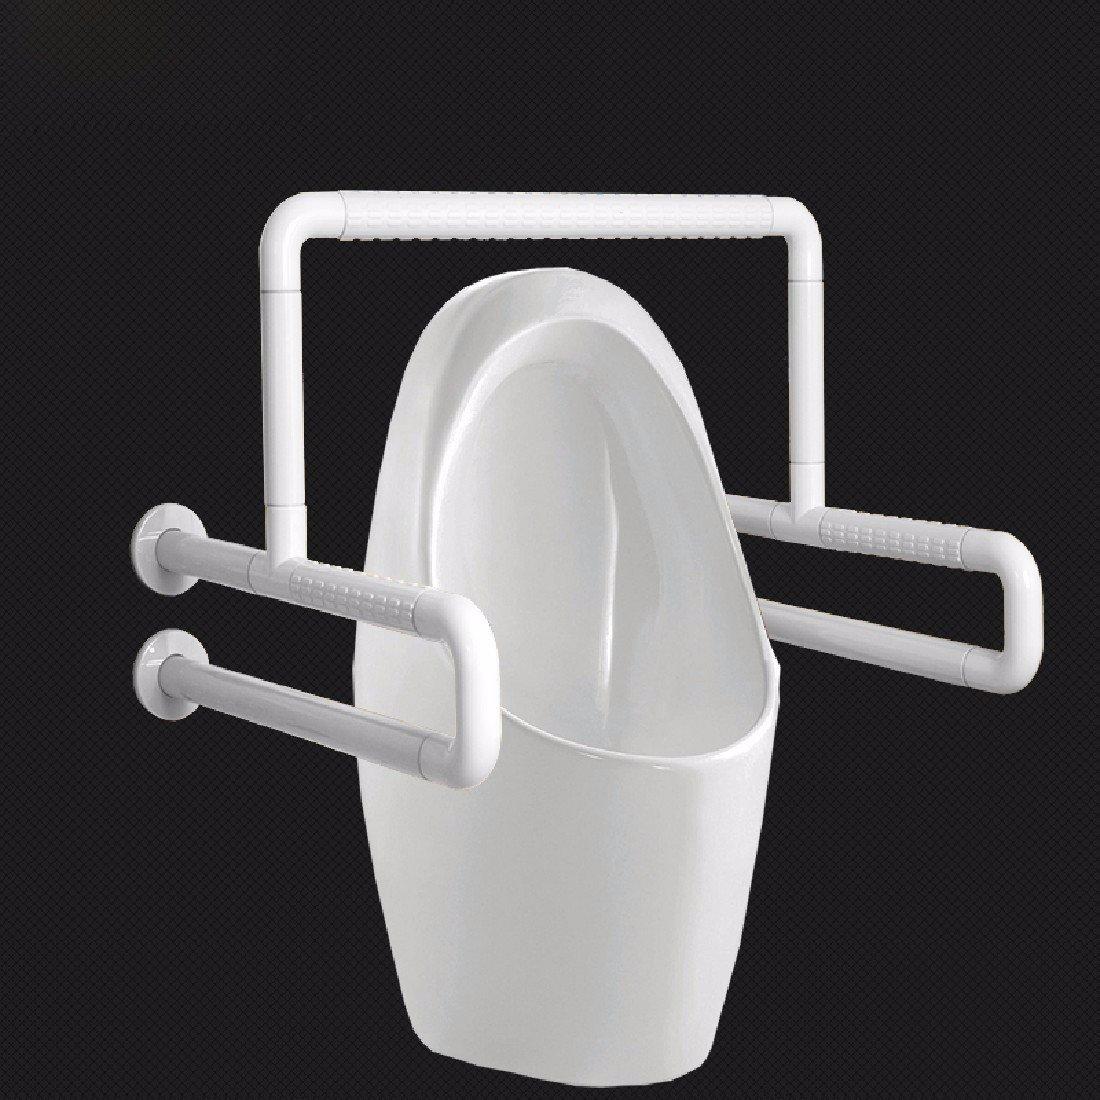 WAWZJ-Handrail Barrier Free Handrail Toilet Toilet Old People'S Anti Slide Pool Handle,White,A